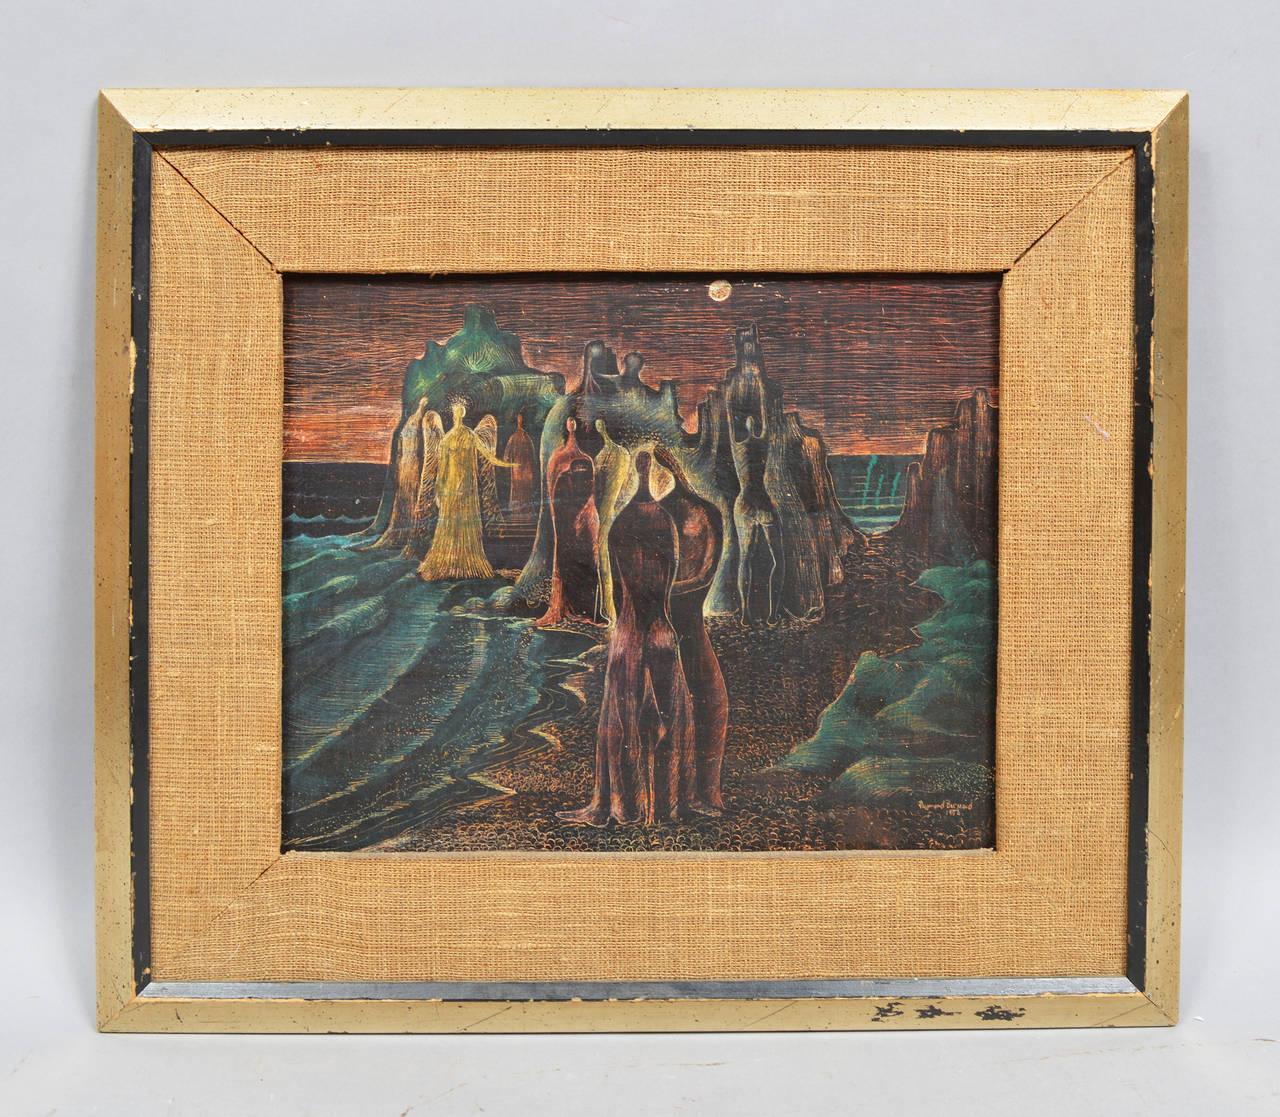 The Beach Gathering - Surrealist Painting by Raymond Brossard